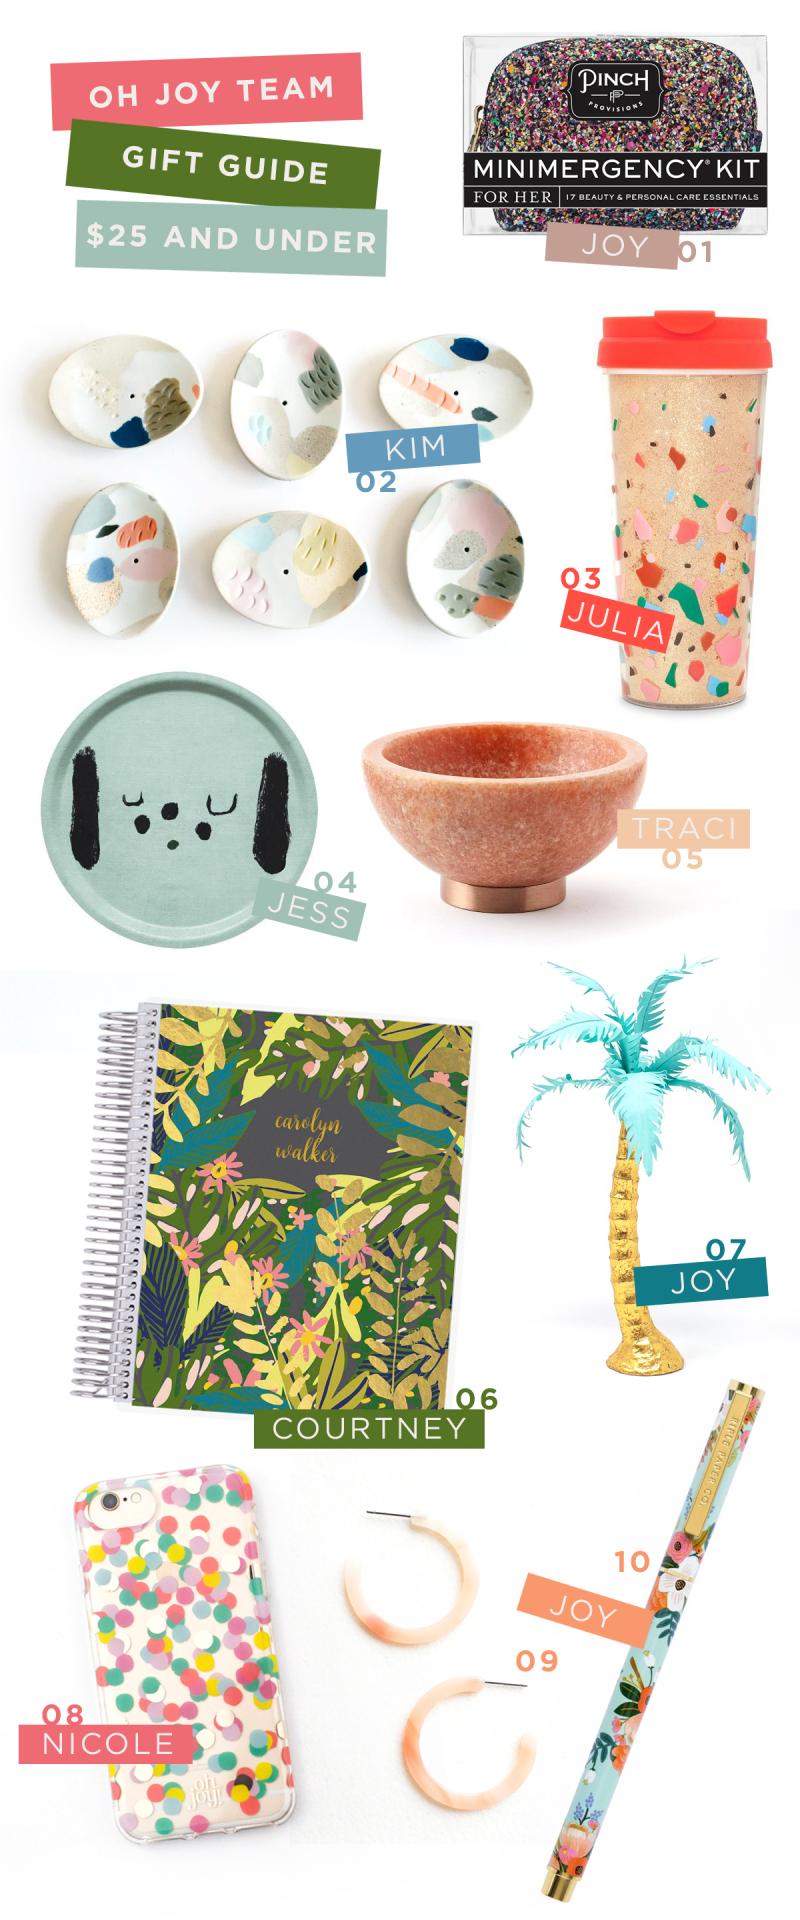 Oh Joy! Team Gift Guide: $25 and Under: Traci, Nicole, Julia, Jess, Kim, Courtney, and Joy / via Oh Joy!